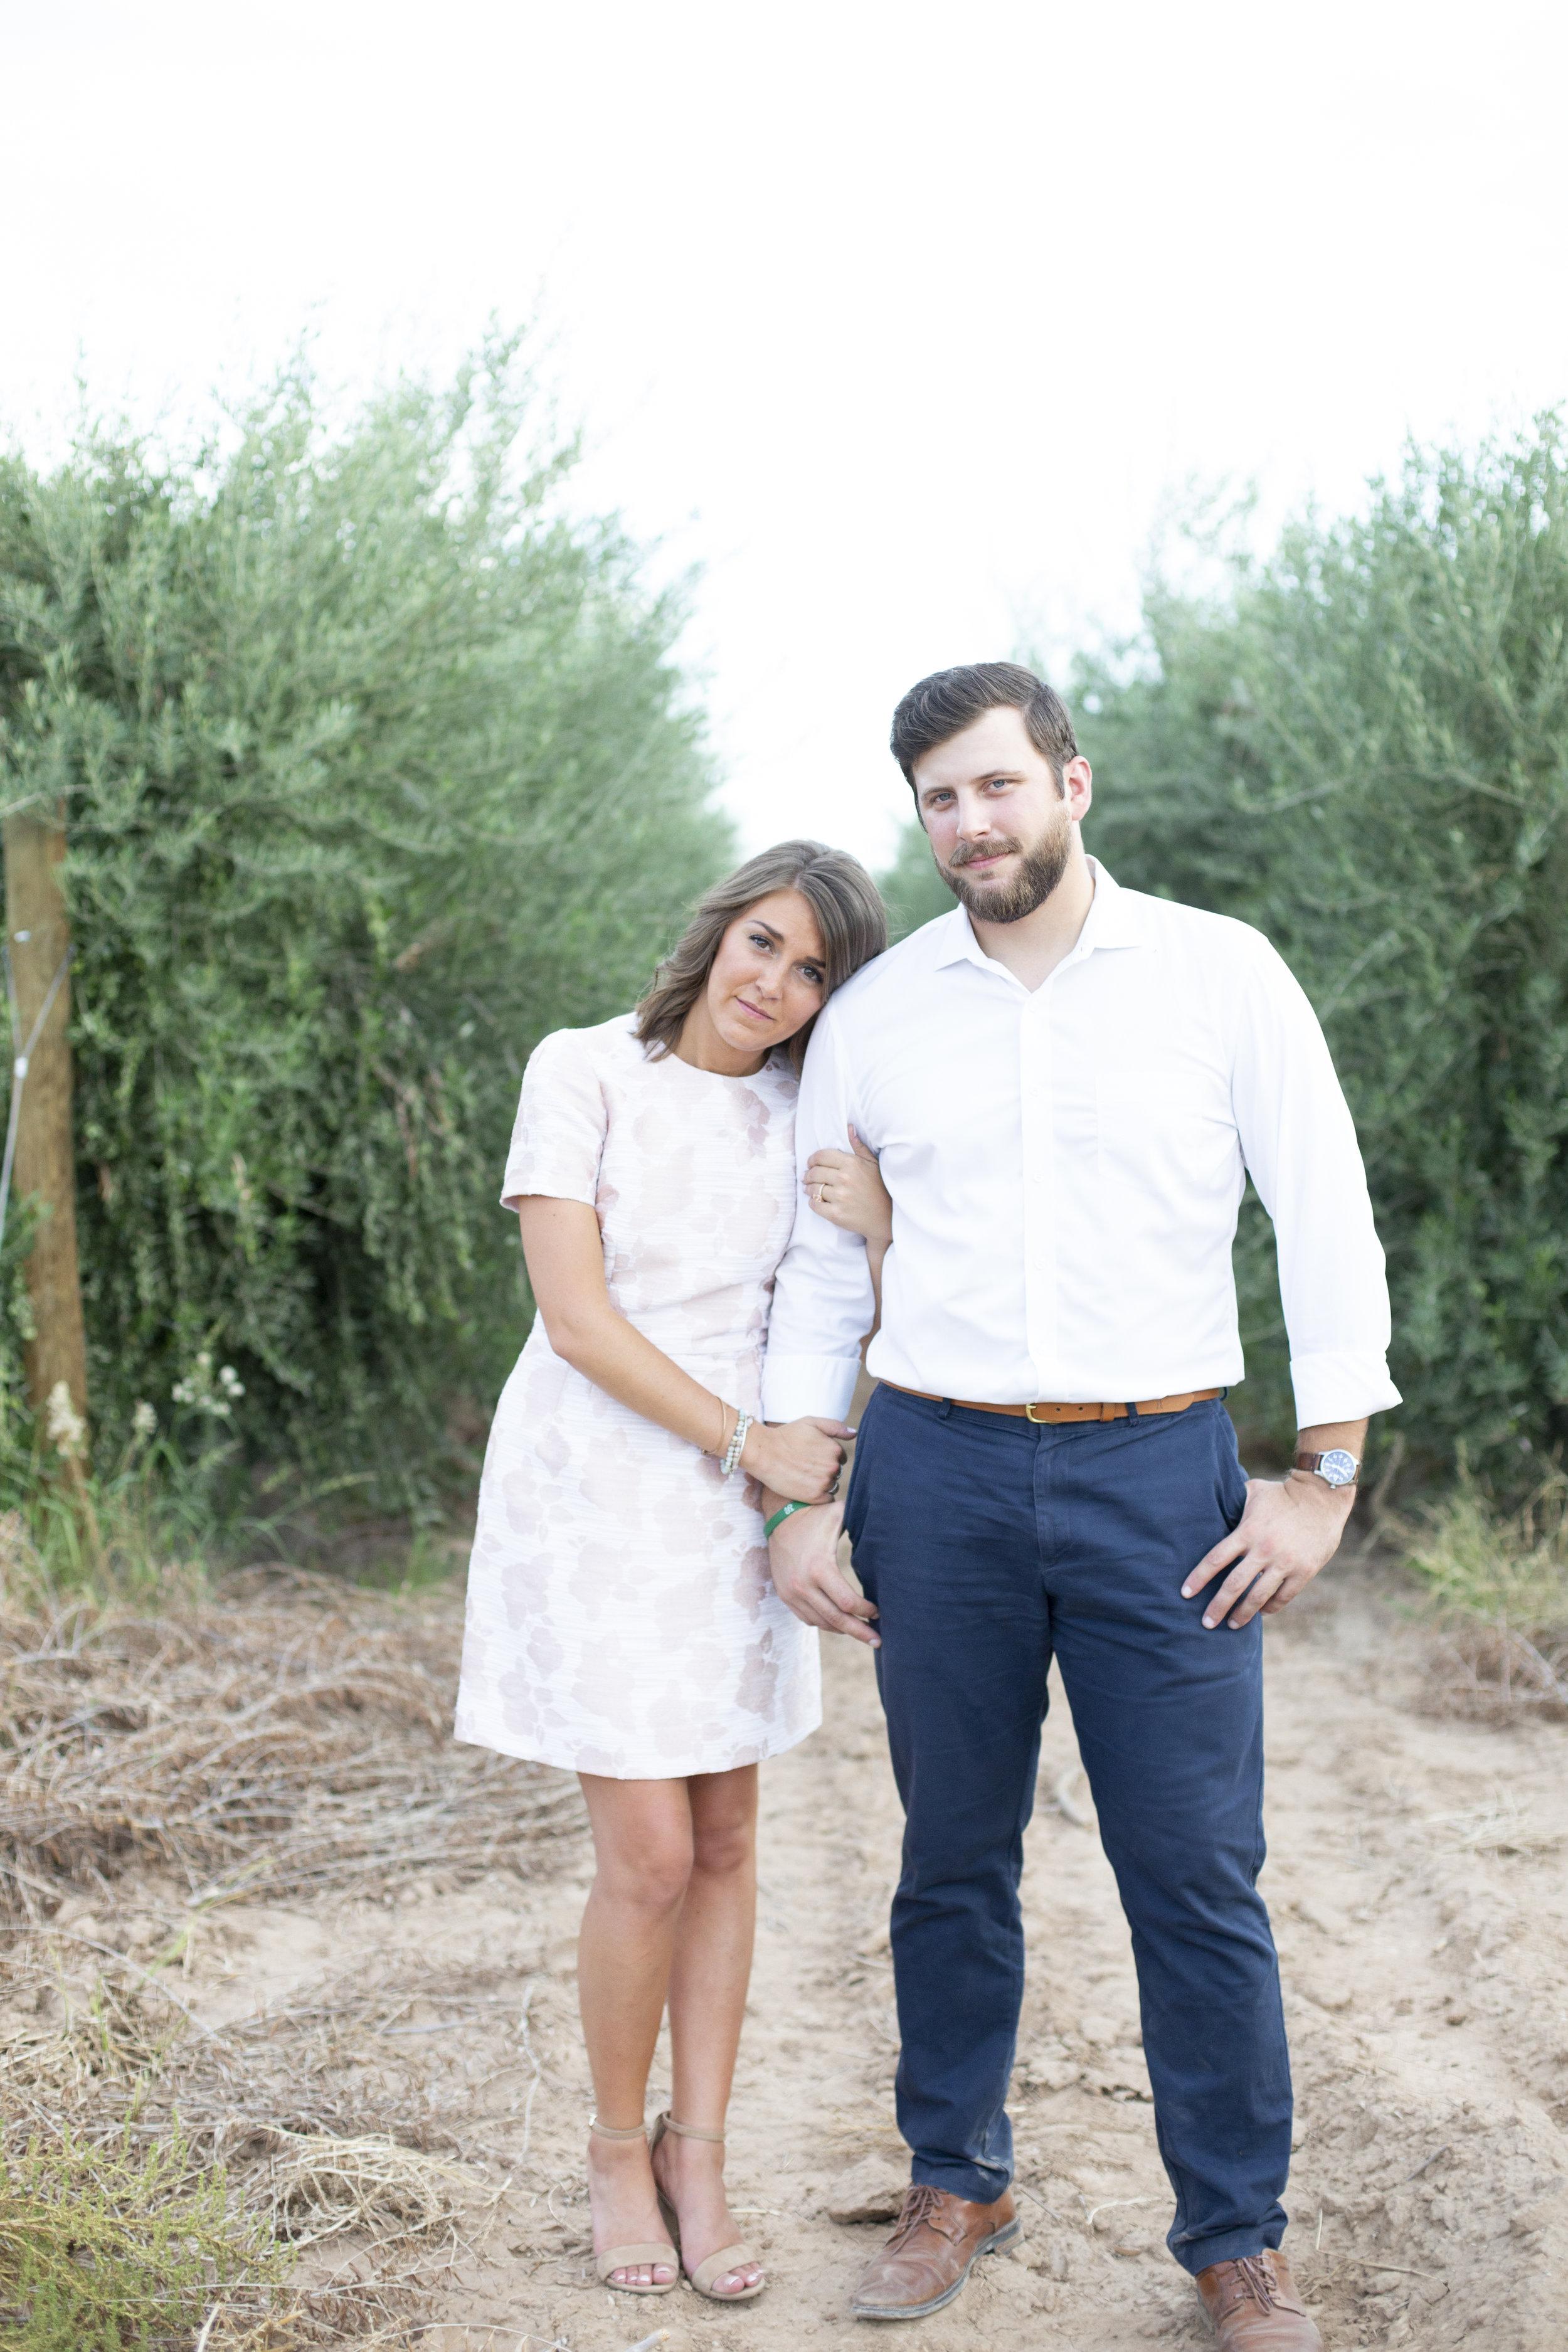 The Cutest Queen Creek Olive Mill Engagement Shoot: Caroline & JR- Konsider It Done- AZ Arizona Wedding & Event Planner, Designer, Coordinator Planning in Scottsdale, Phoenix, Paradise Valley, Tempe, Gilbert, Mesa, Chandler, Tucson, Sedona